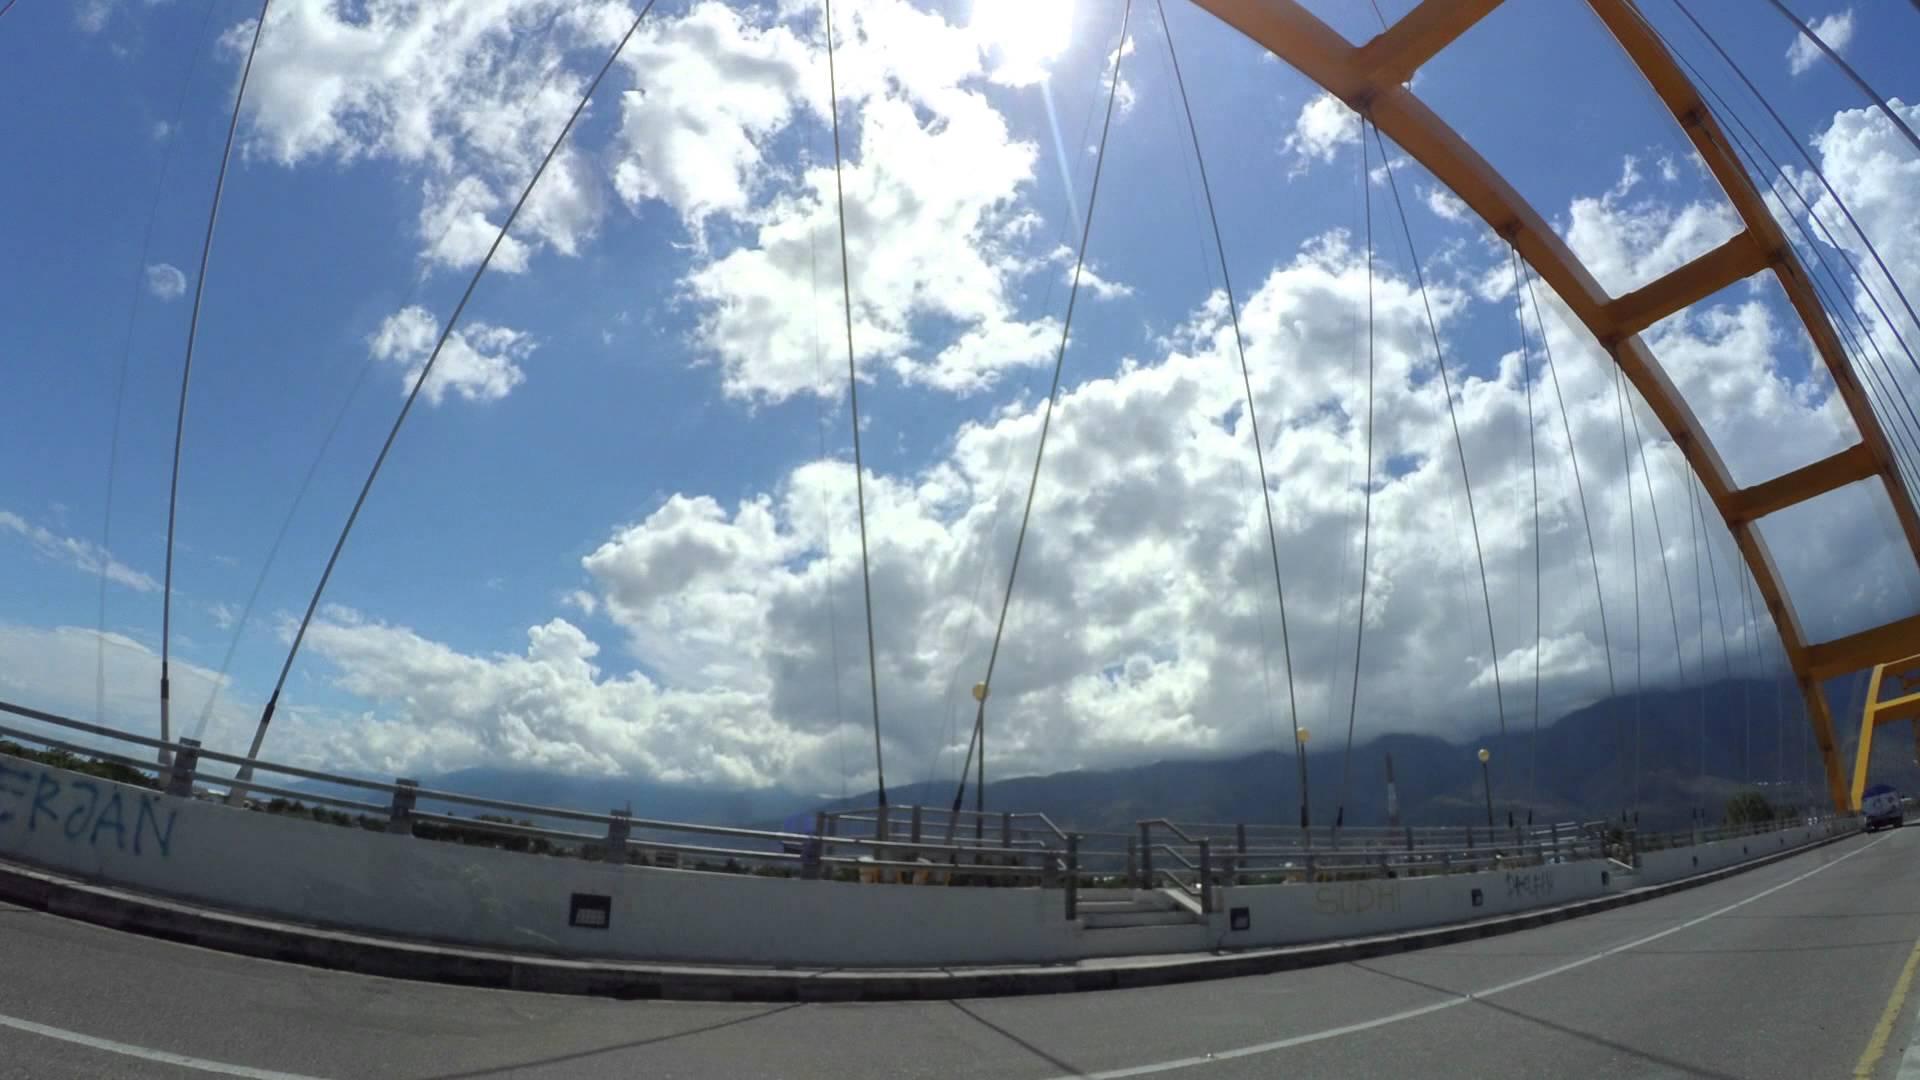 Hyperlapse Anjungan Nusantara Jembatan Kuning Palu Youtube Kota